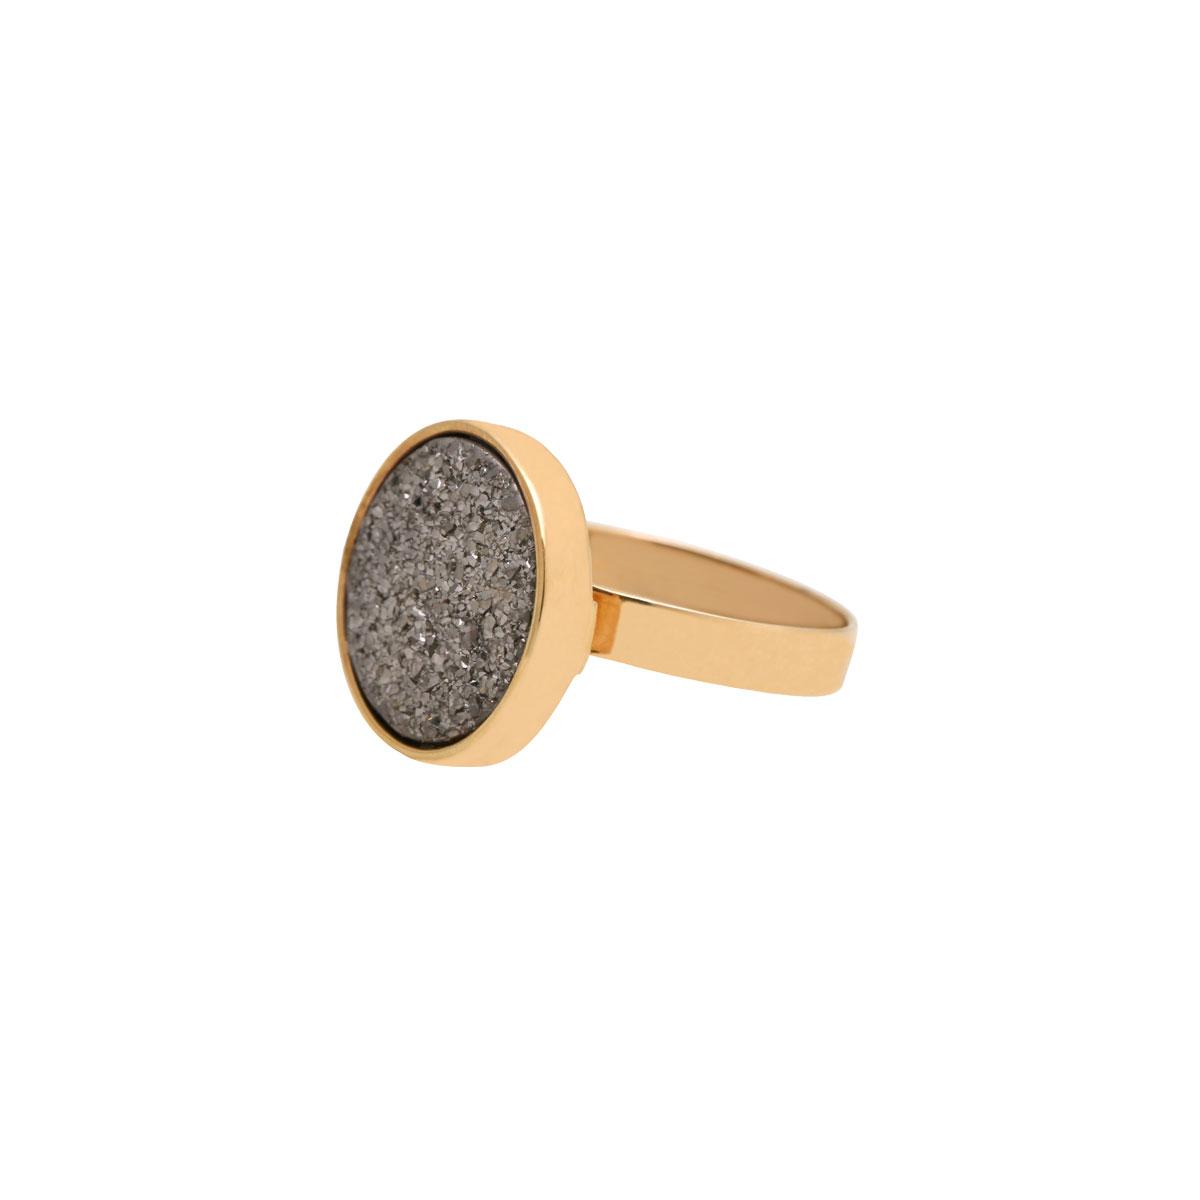 انگشتر طلا کوارتز نقره ای 2